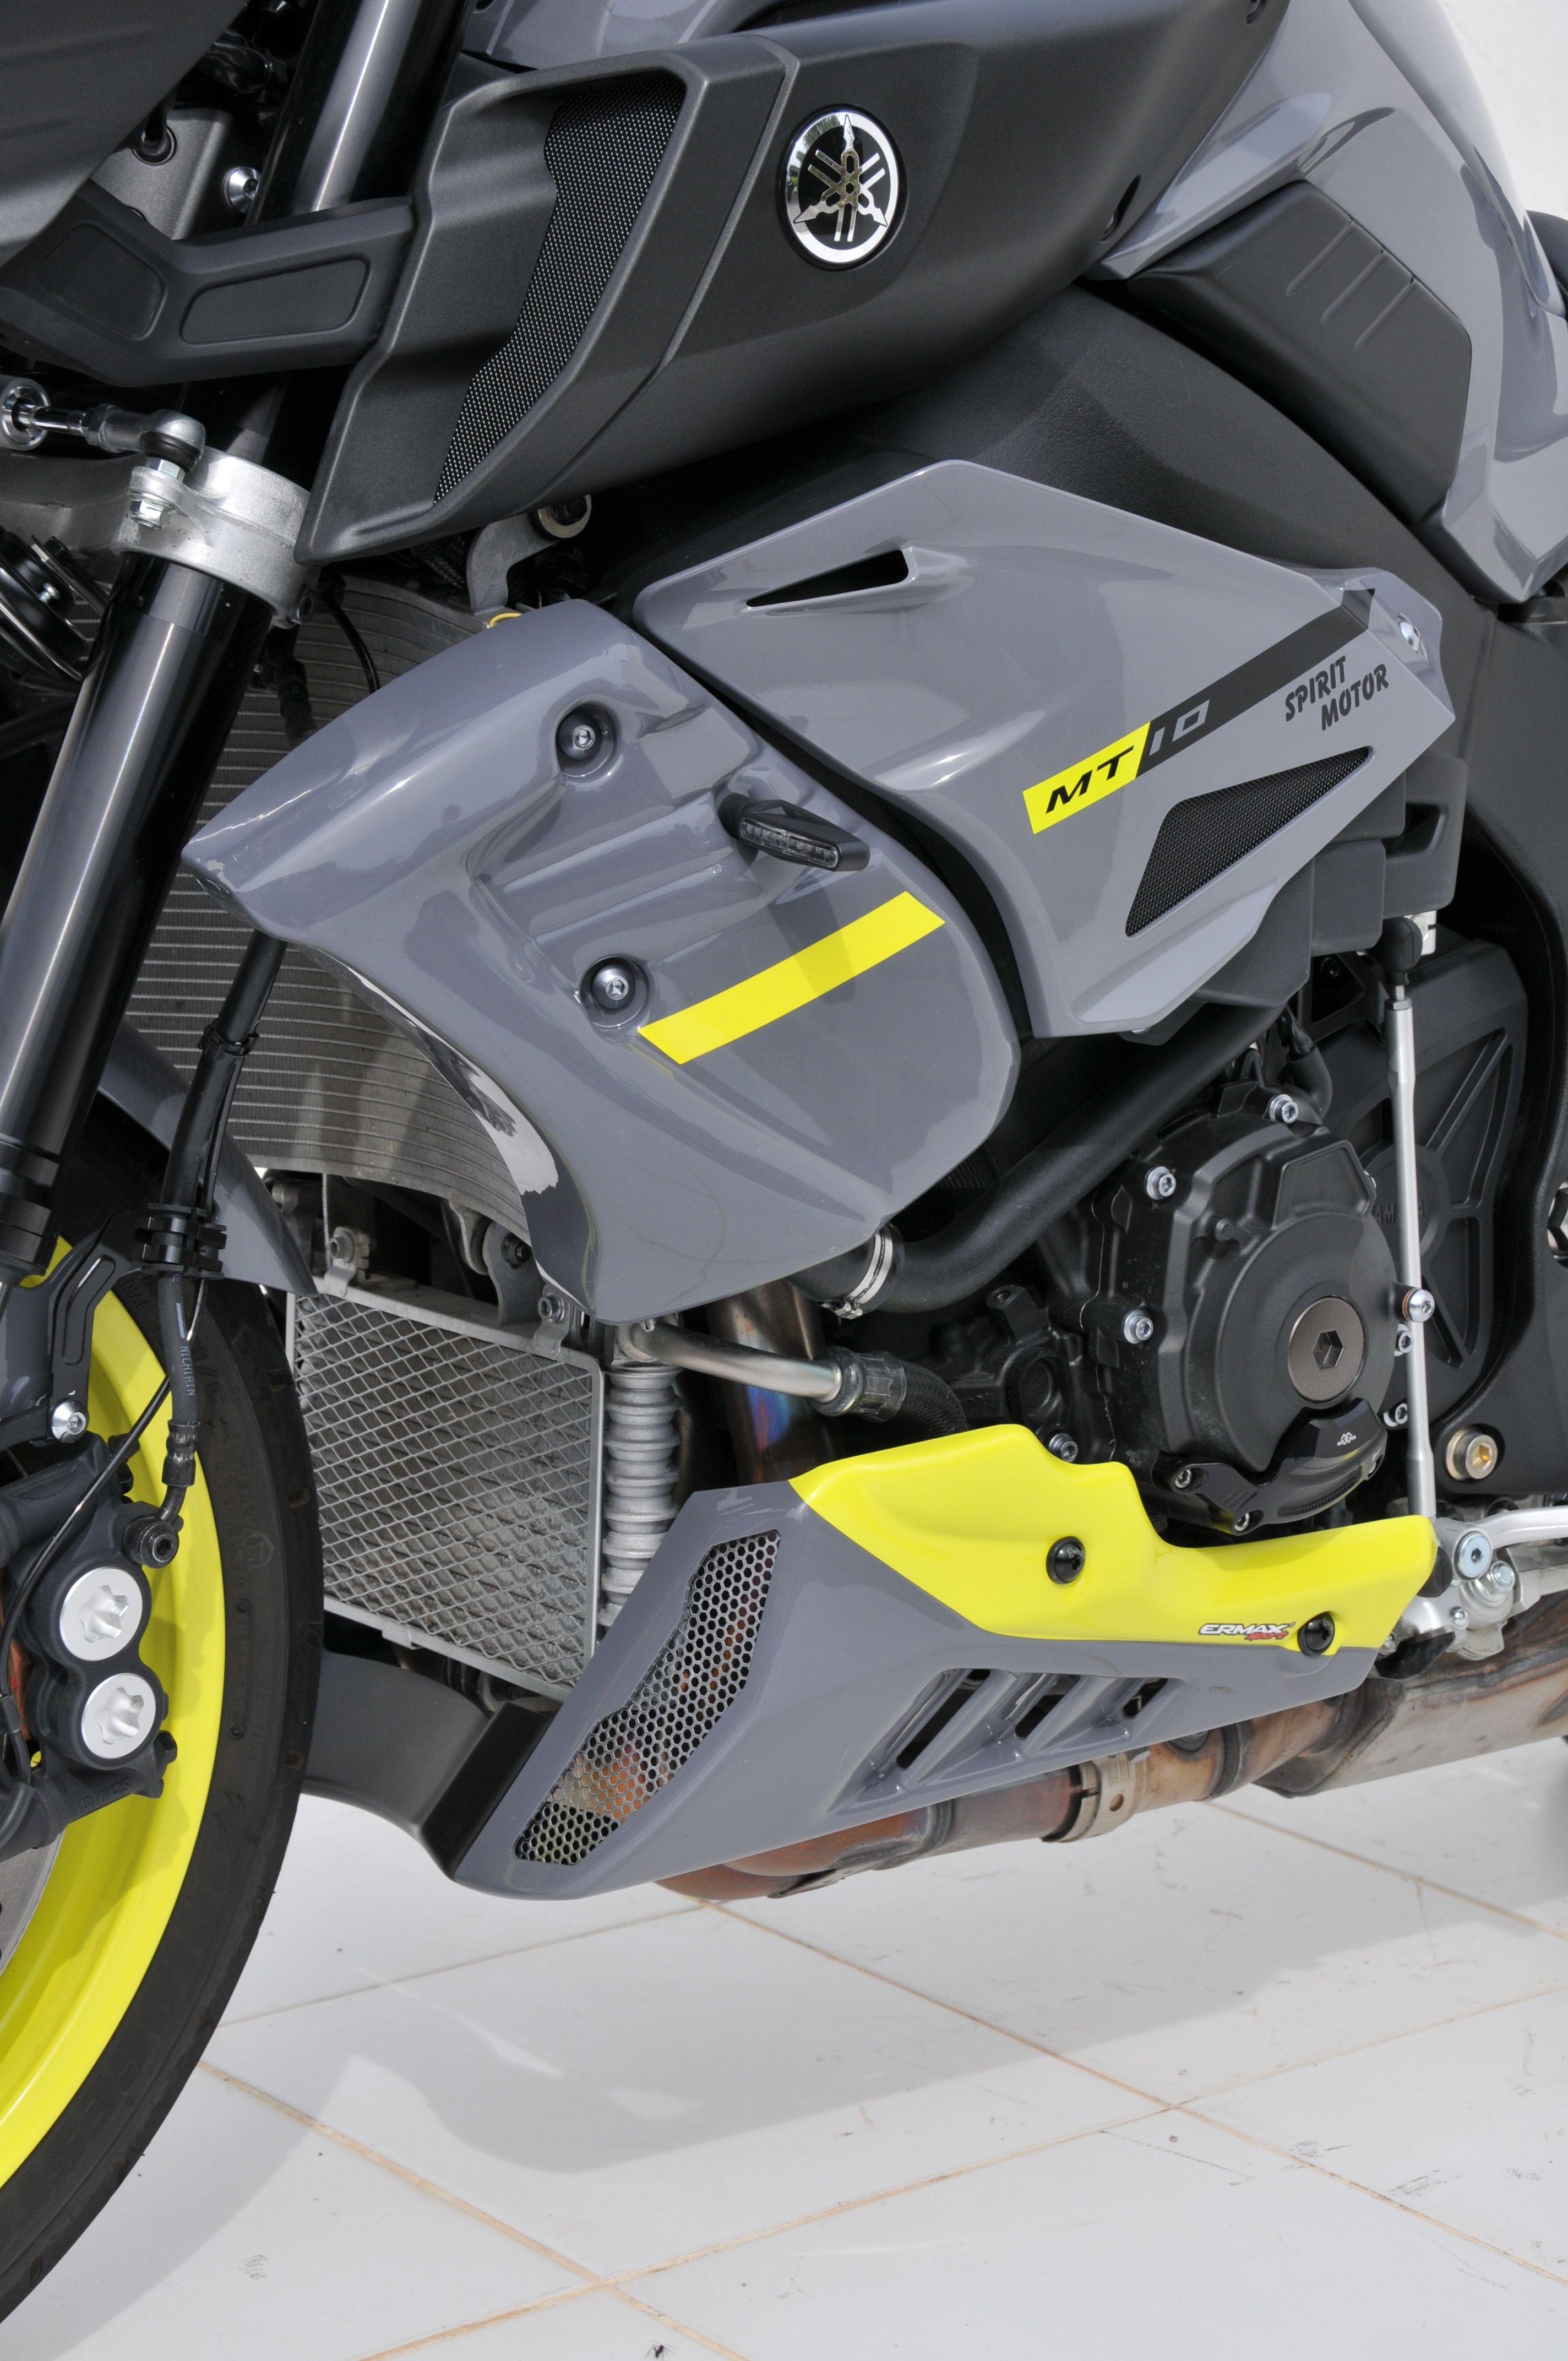 Béquille arrière - Yamaha, Bike, Touring - 웹